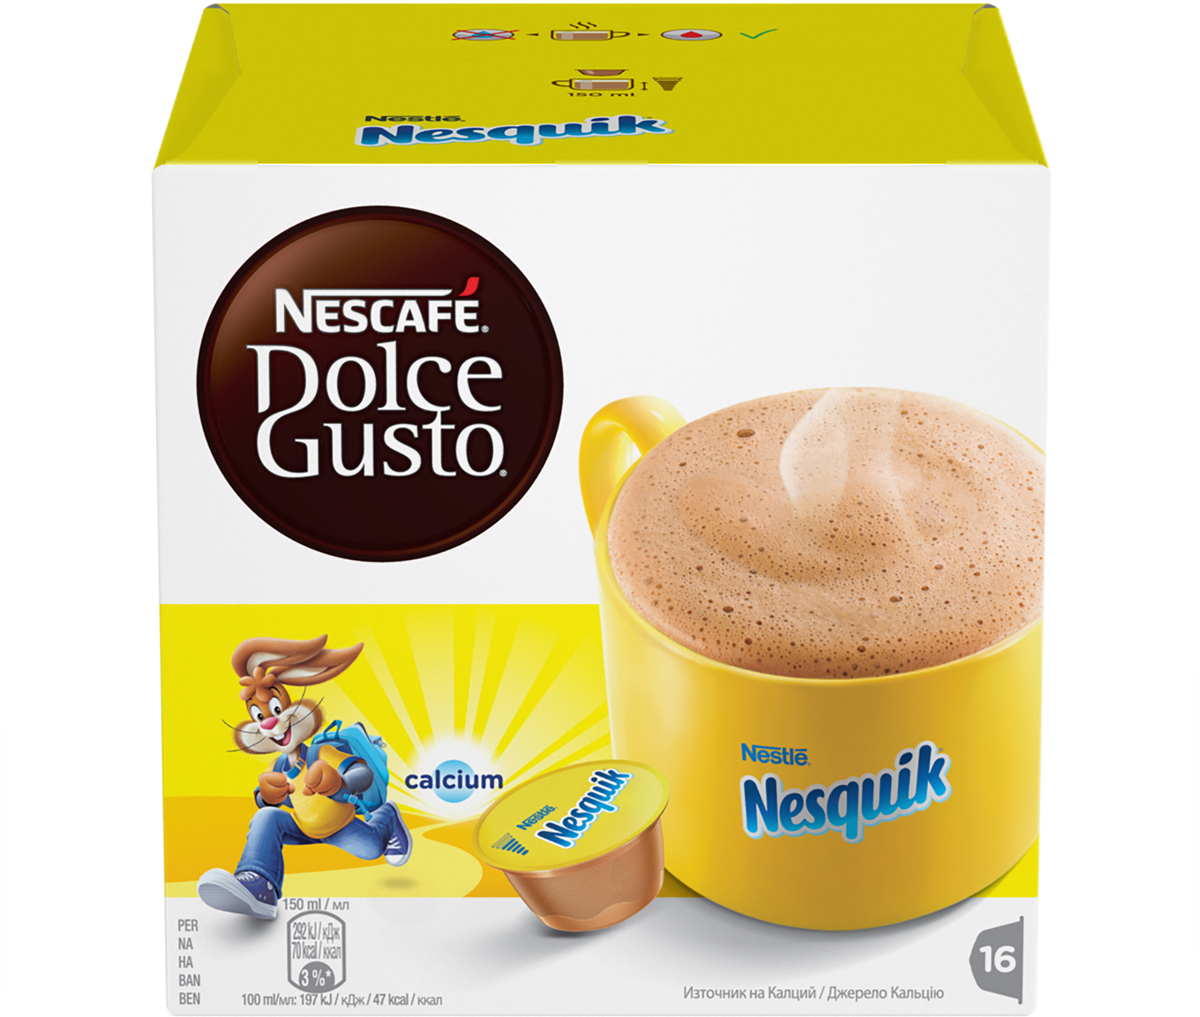 Nescafe Dolce Gusto Nesquik какао в капсулах, 16 шт